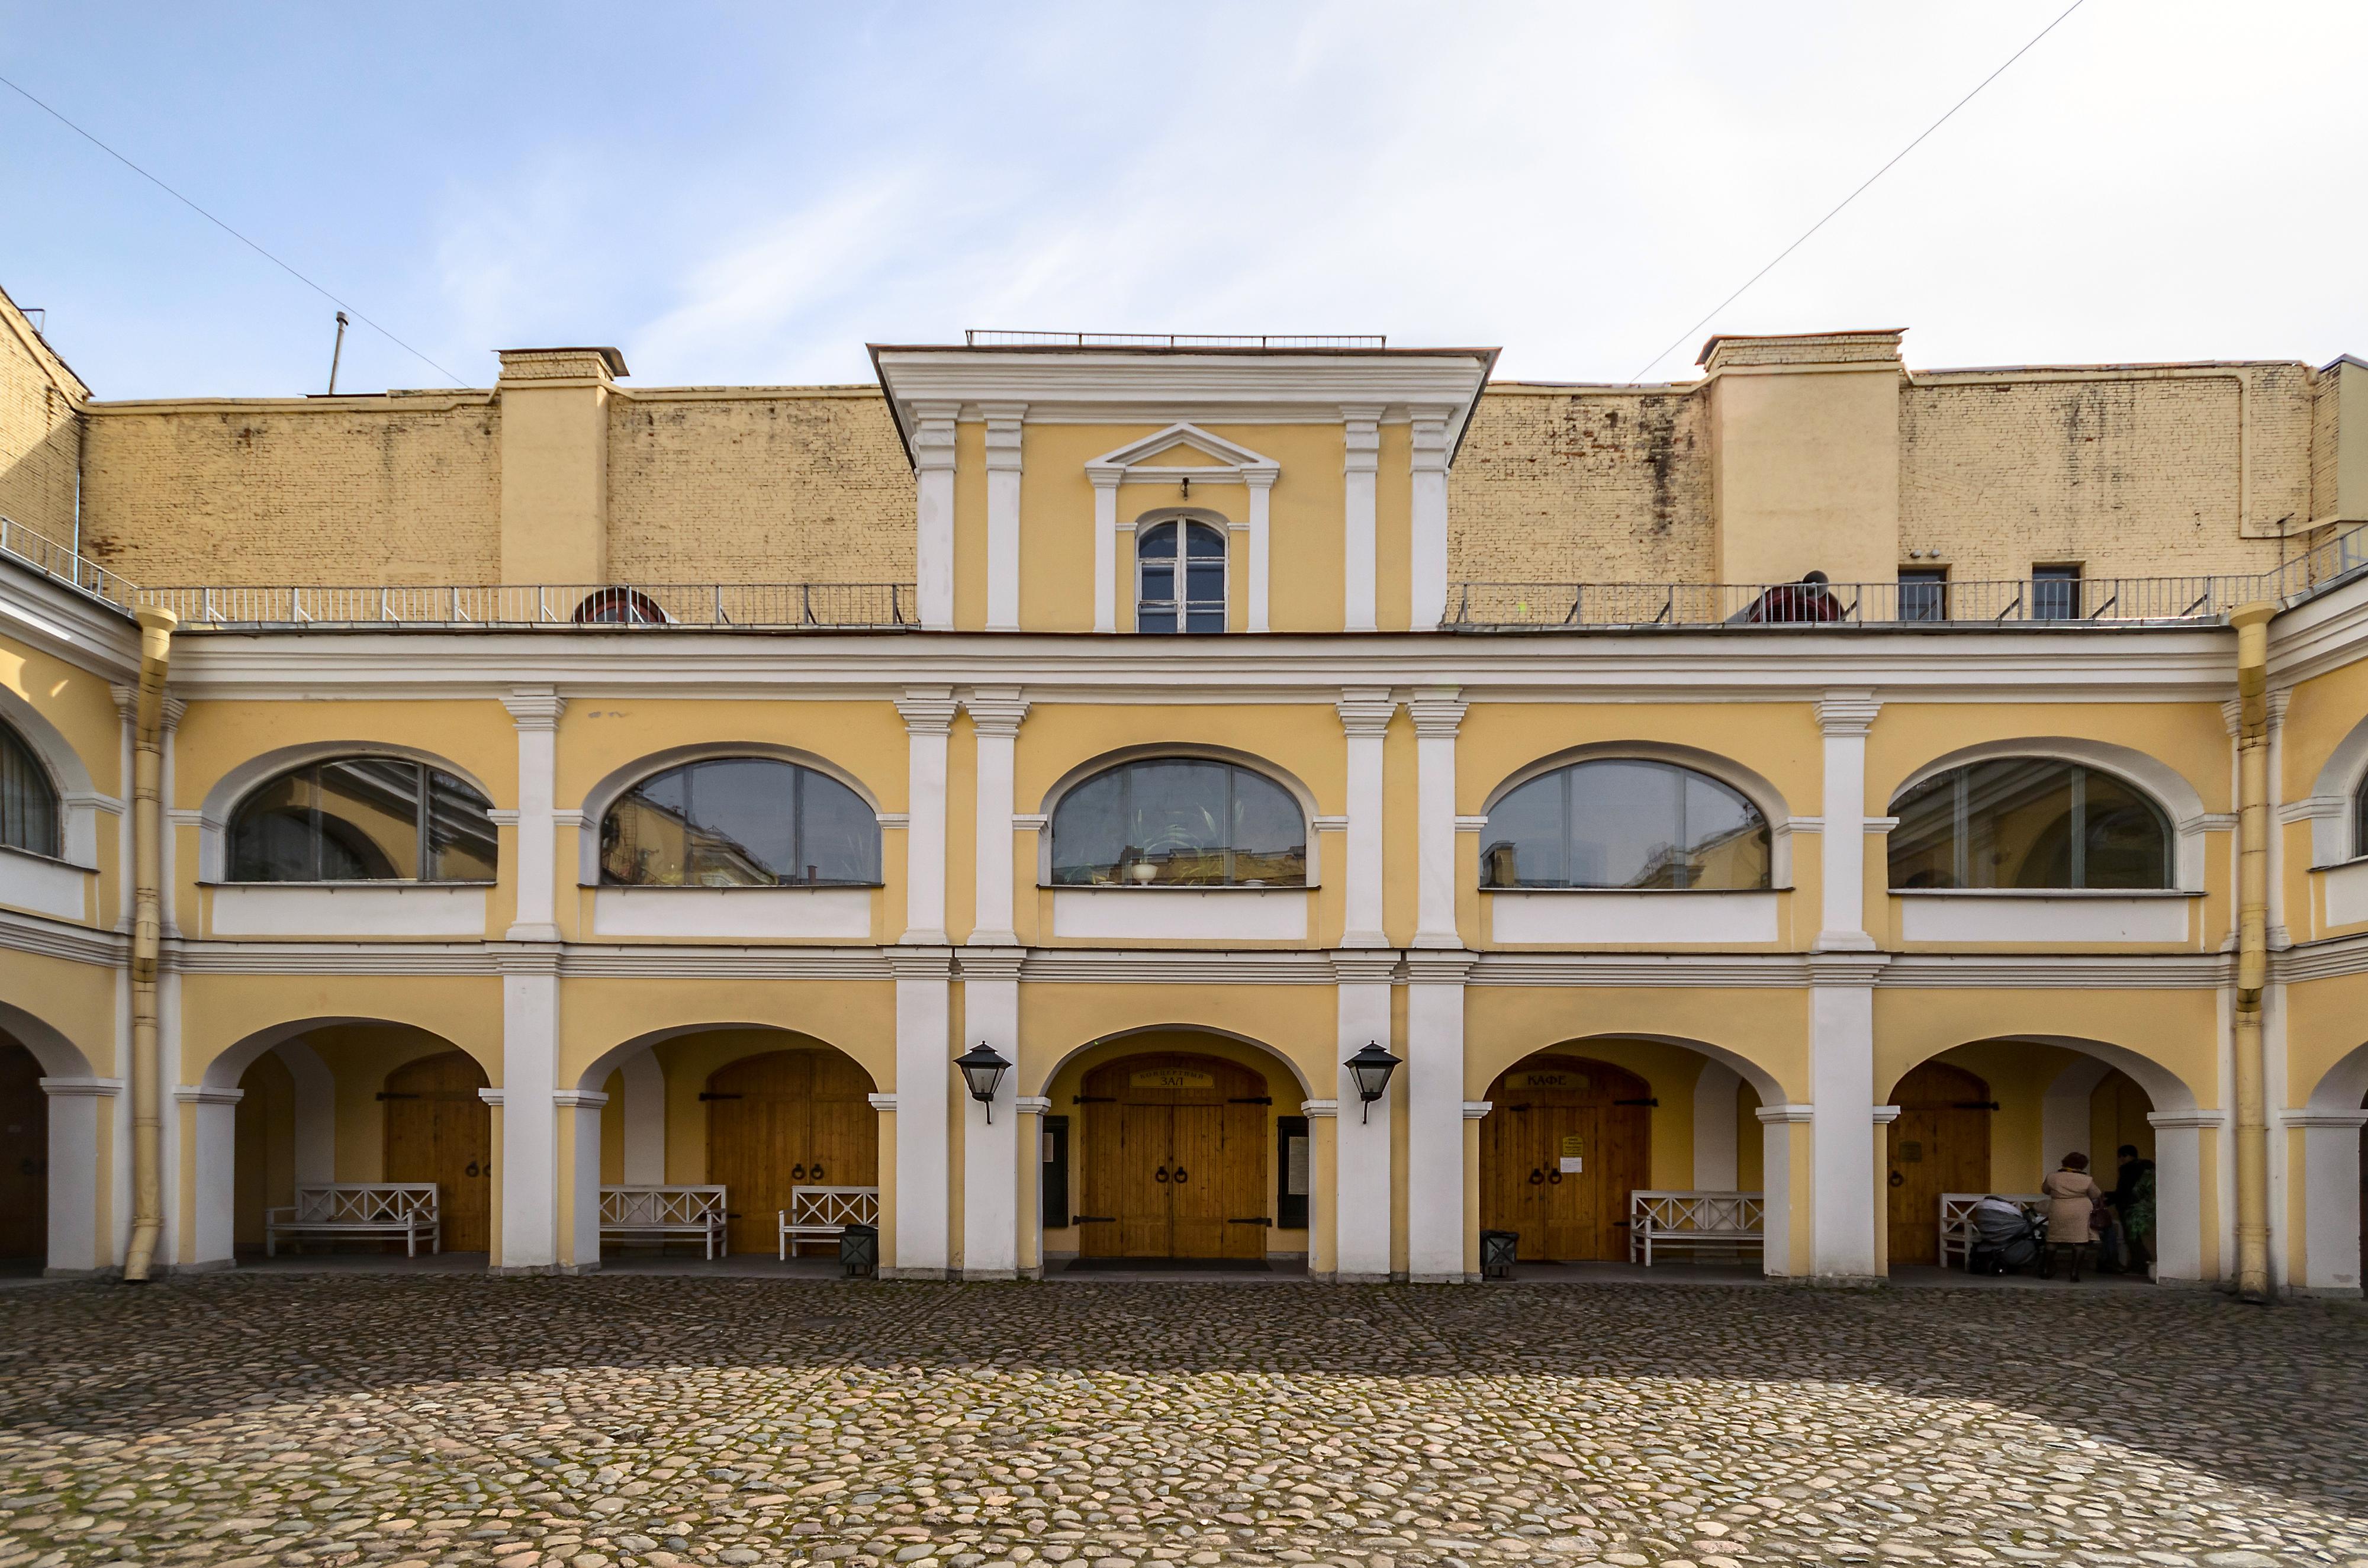 Pushkin Apartment Museum SPB 06.jpg English: Сourtyard of the Memorial Pushkin Apartment Museum in Saint Petersburg Русский: Двор Мемориального